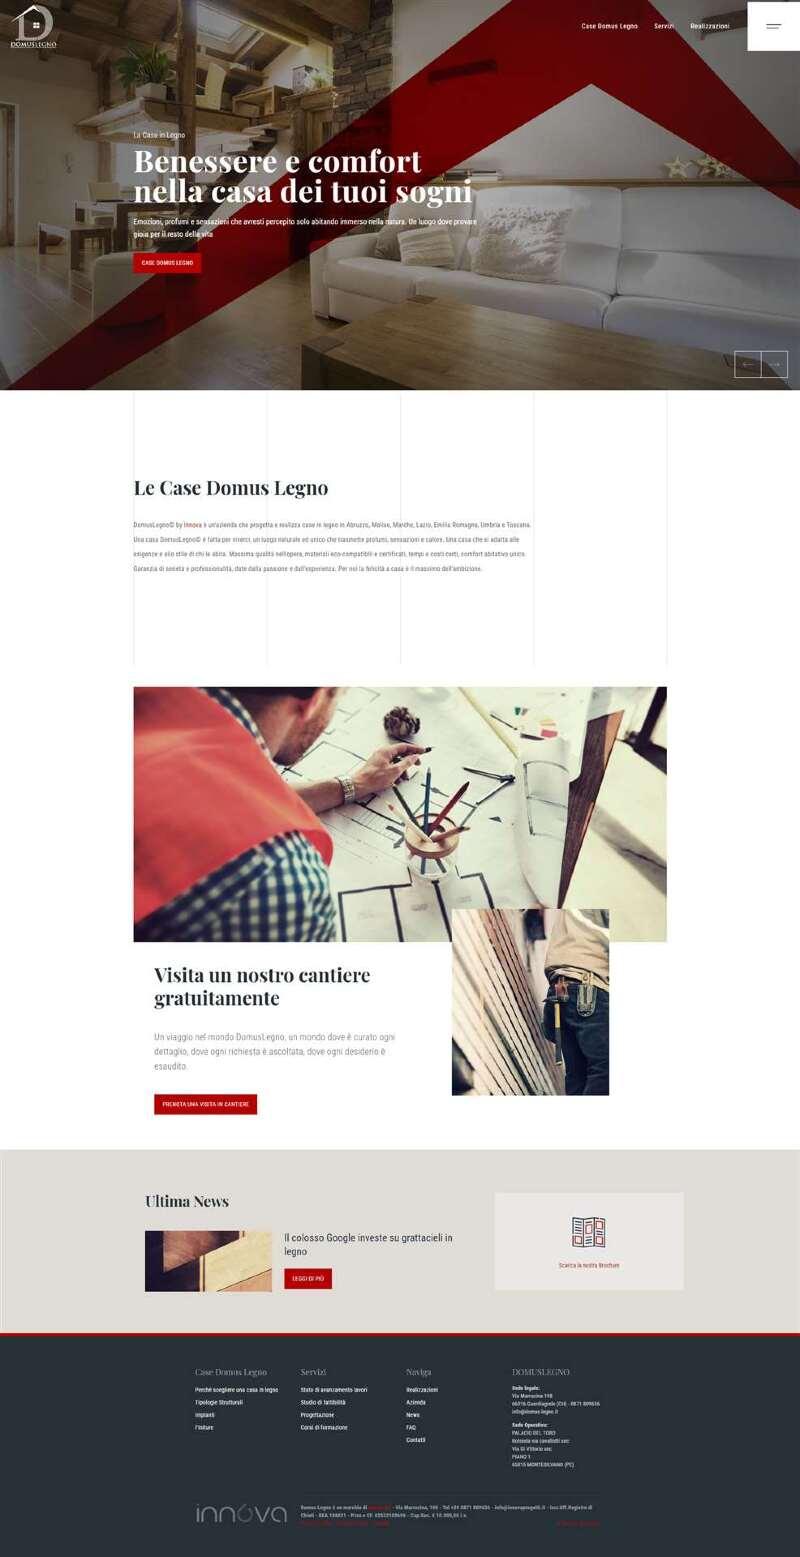 screencapture-domus-legno-it-2019-09-02-12-09-03.jpg